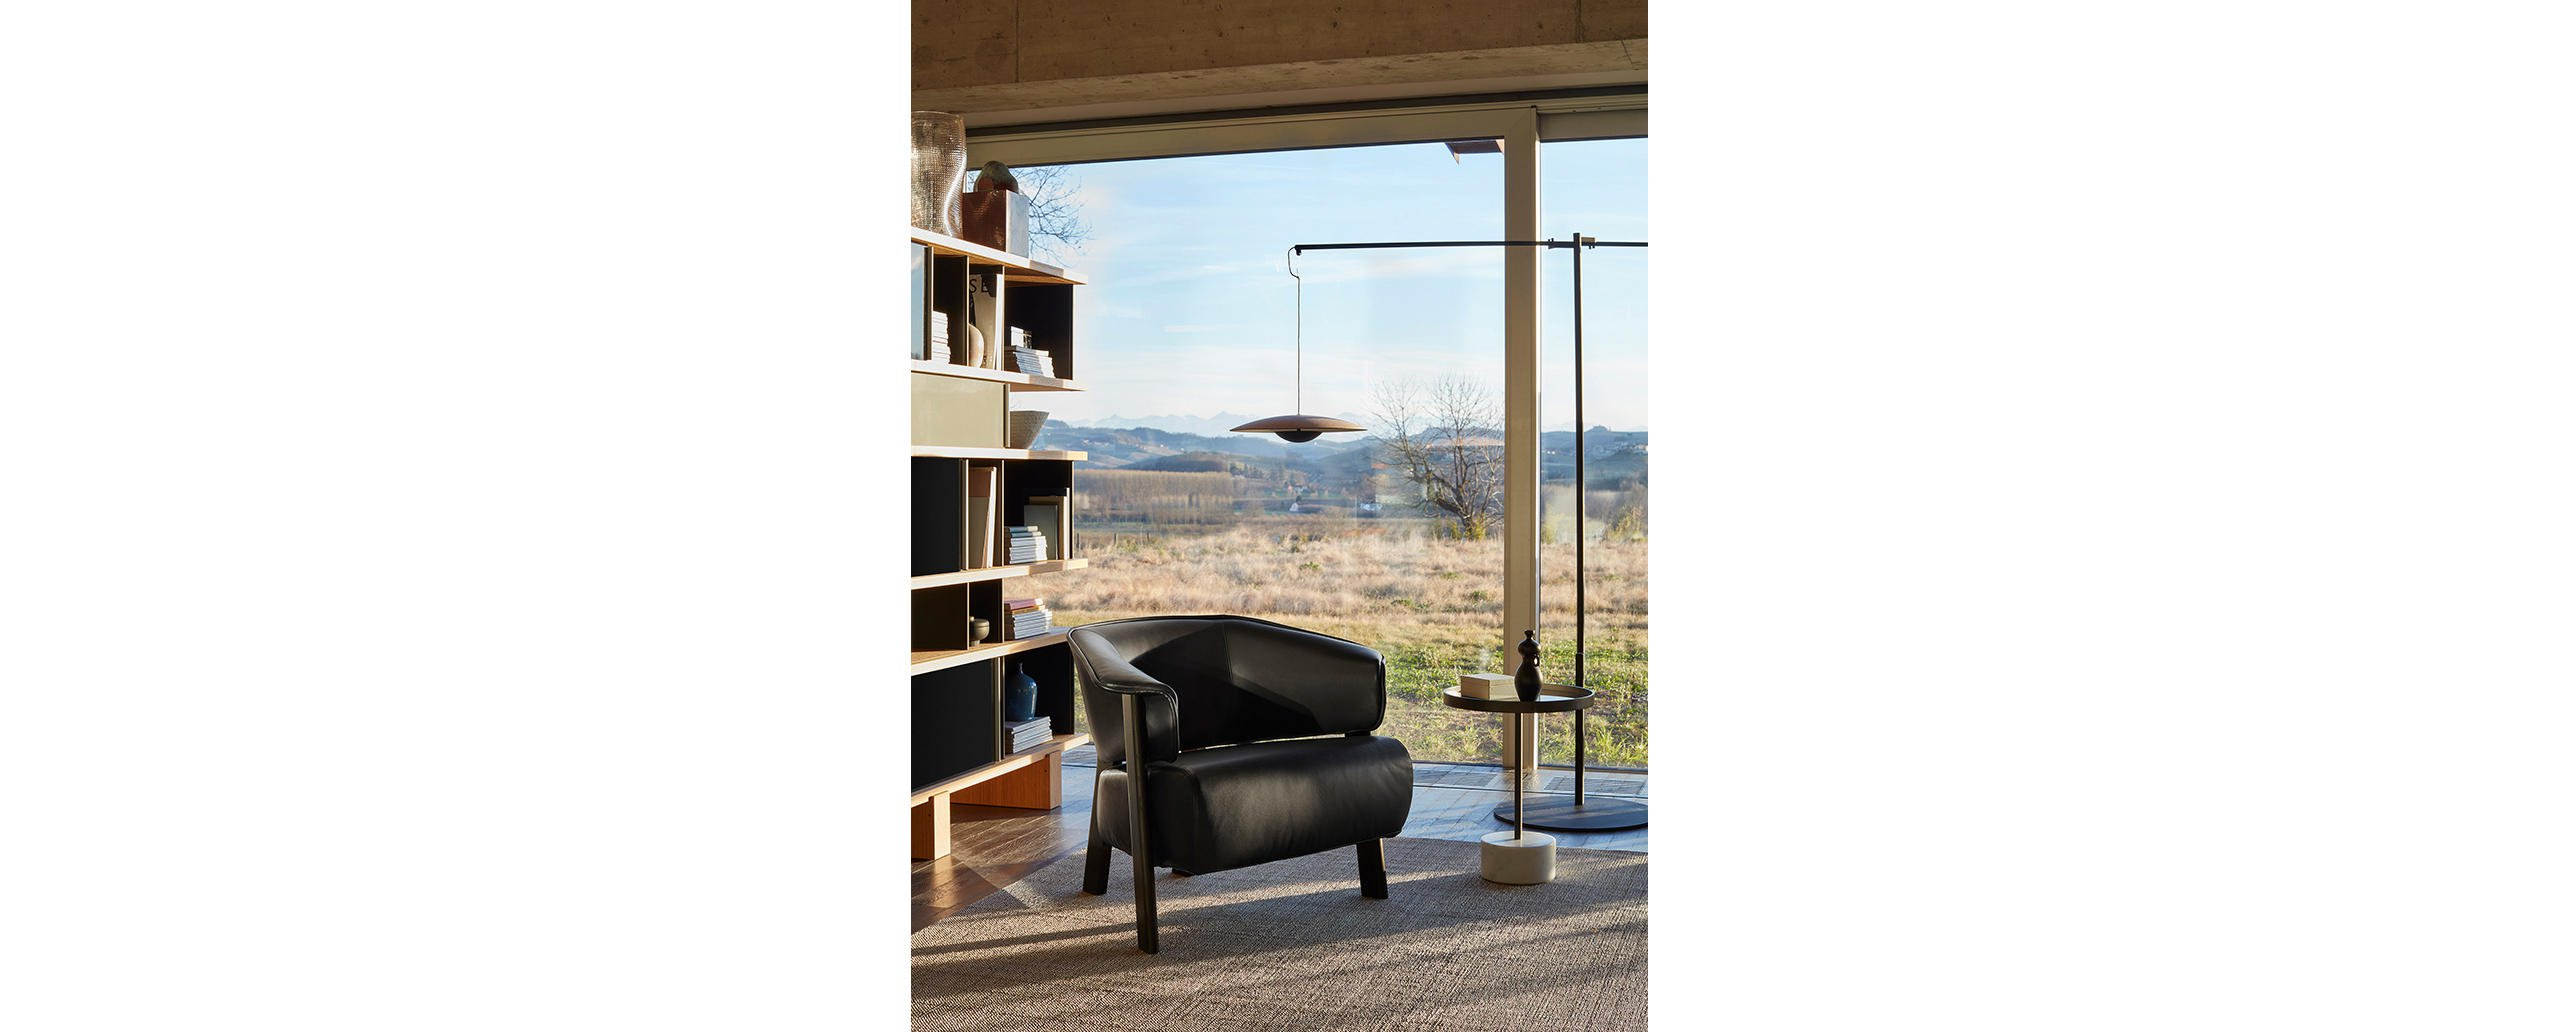 4_cassina_back-wing_armchair_patricia_urquiola_photodepasqualemaffini